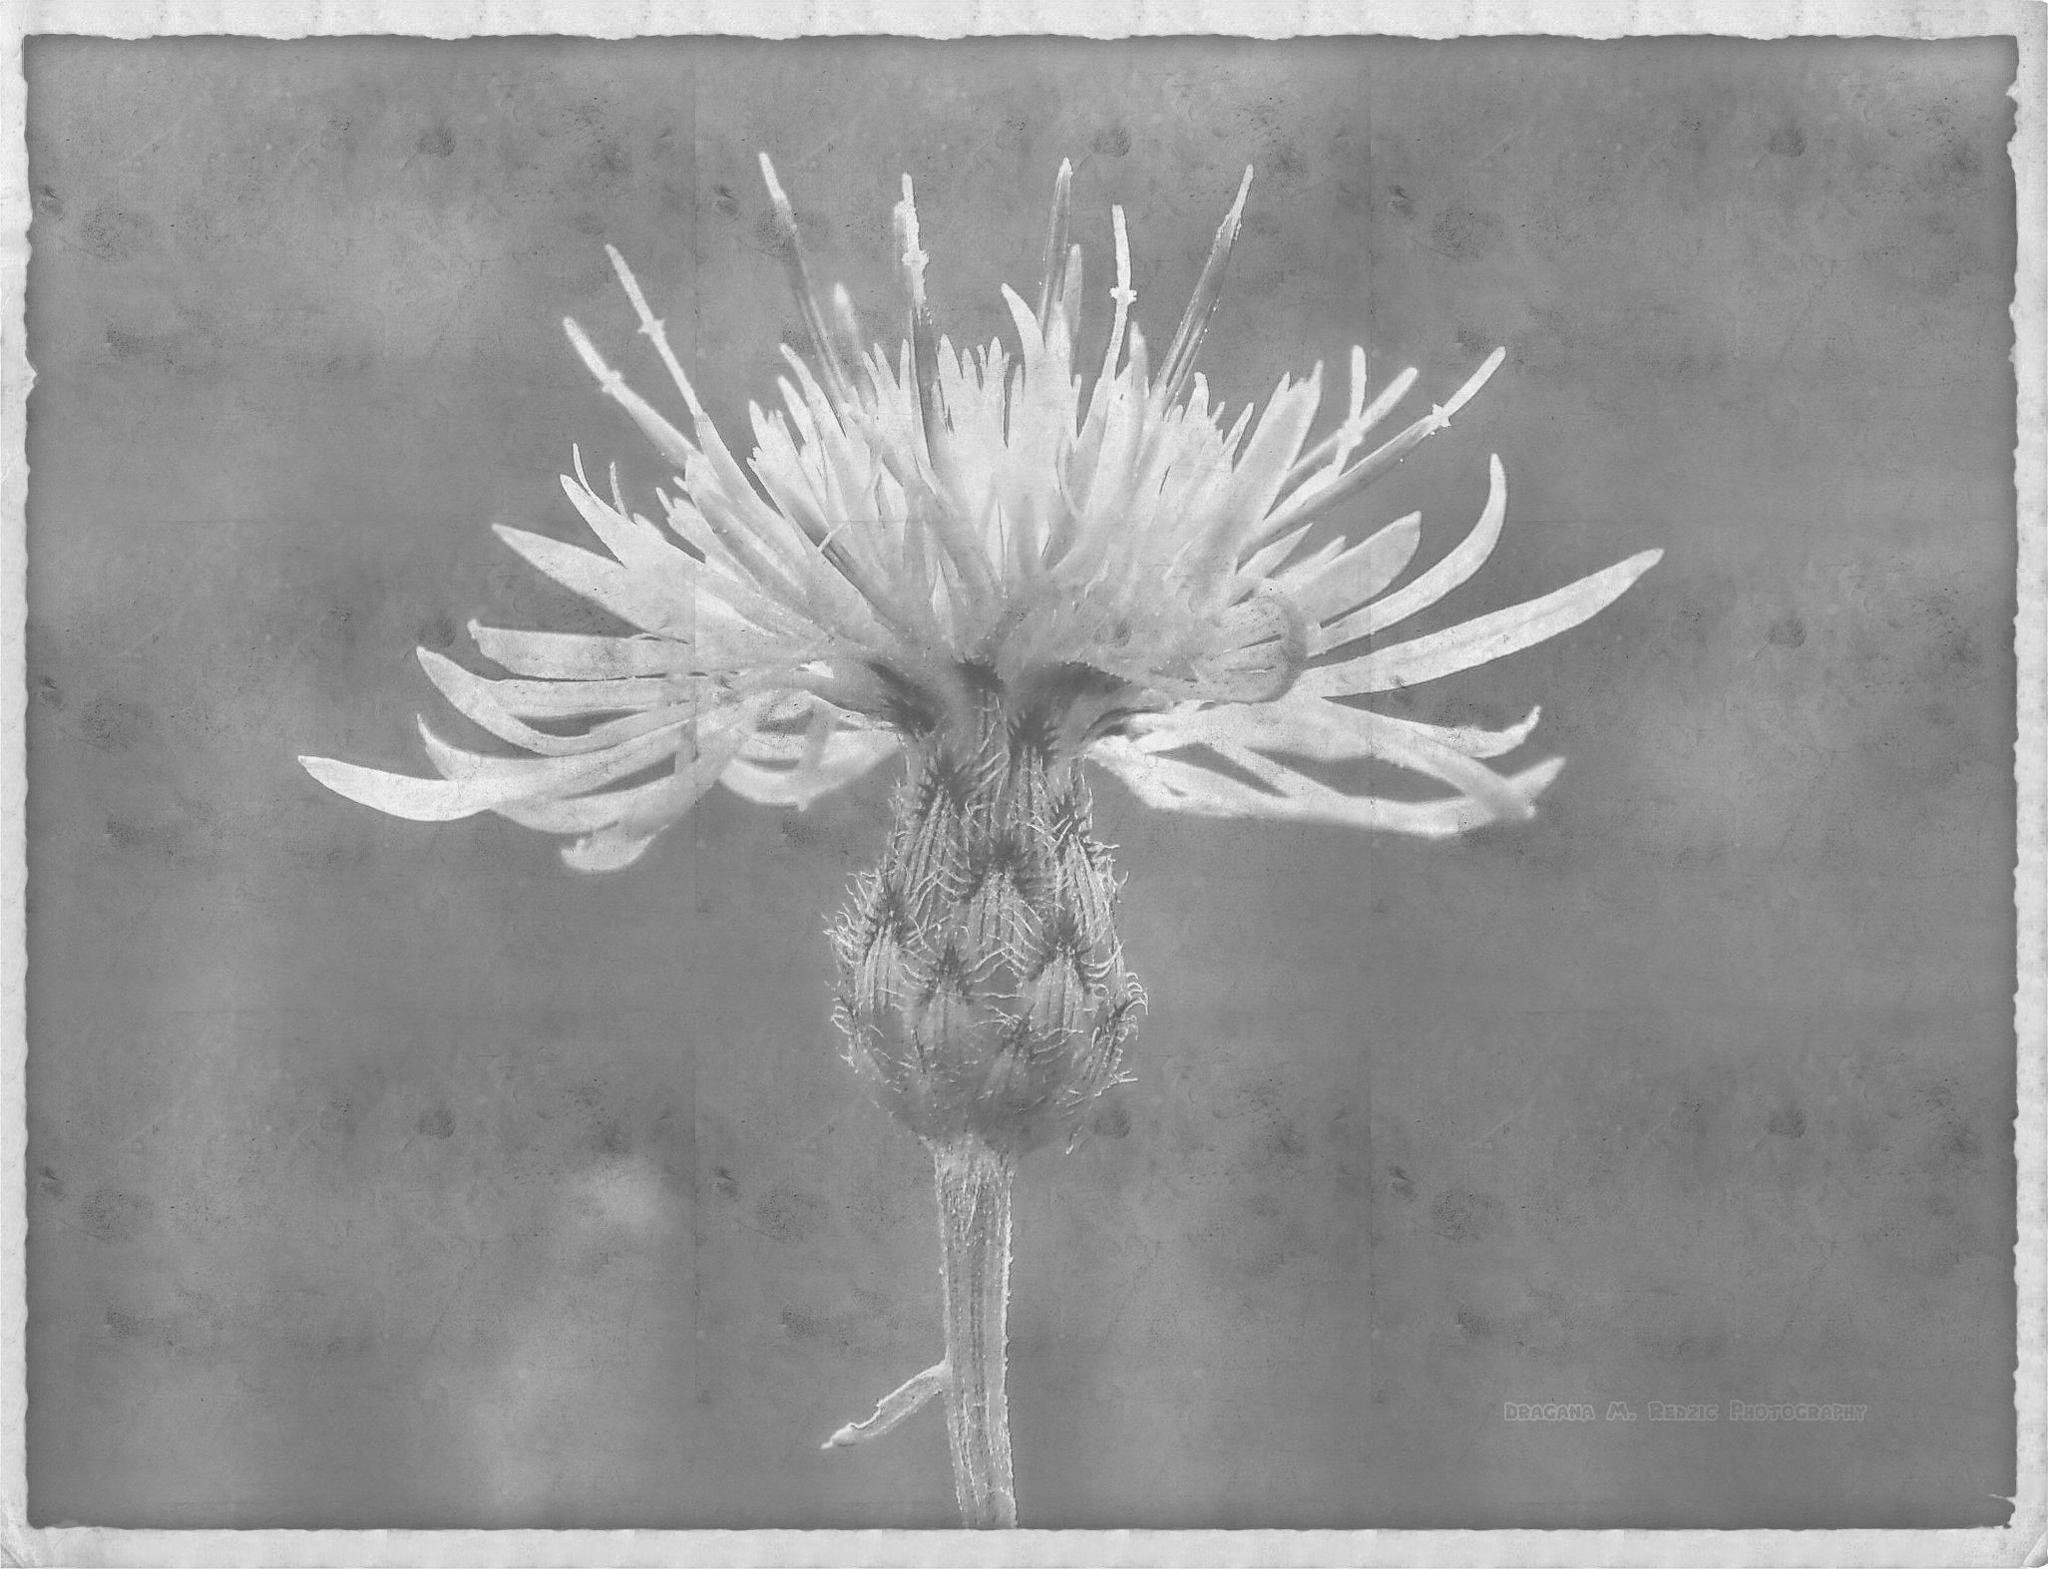 Centaurea stoebe L. ssp.  ~ Art photo (old photo/B&W) by Драгана М. Реџић